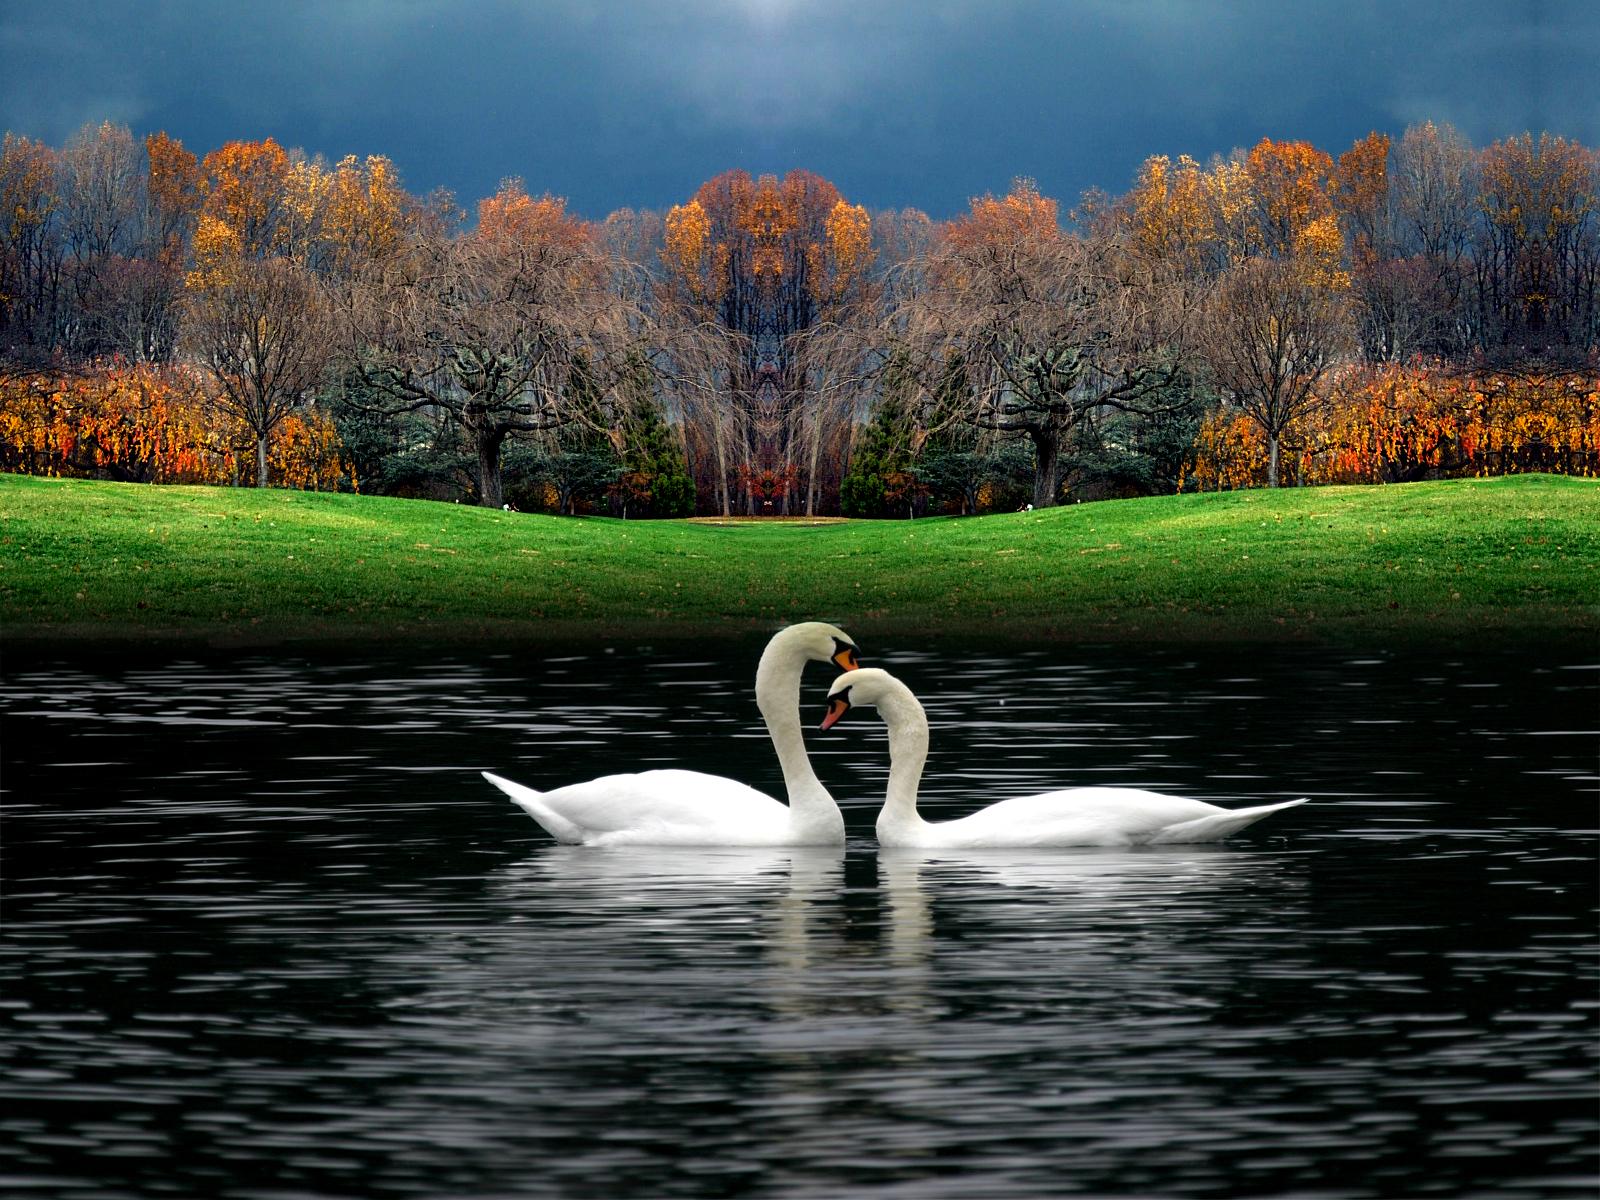 Hd wallpaper beautiful - Beautiful Nature Wallpaper Beautiful Nature Wallpaper Beautiful Nature